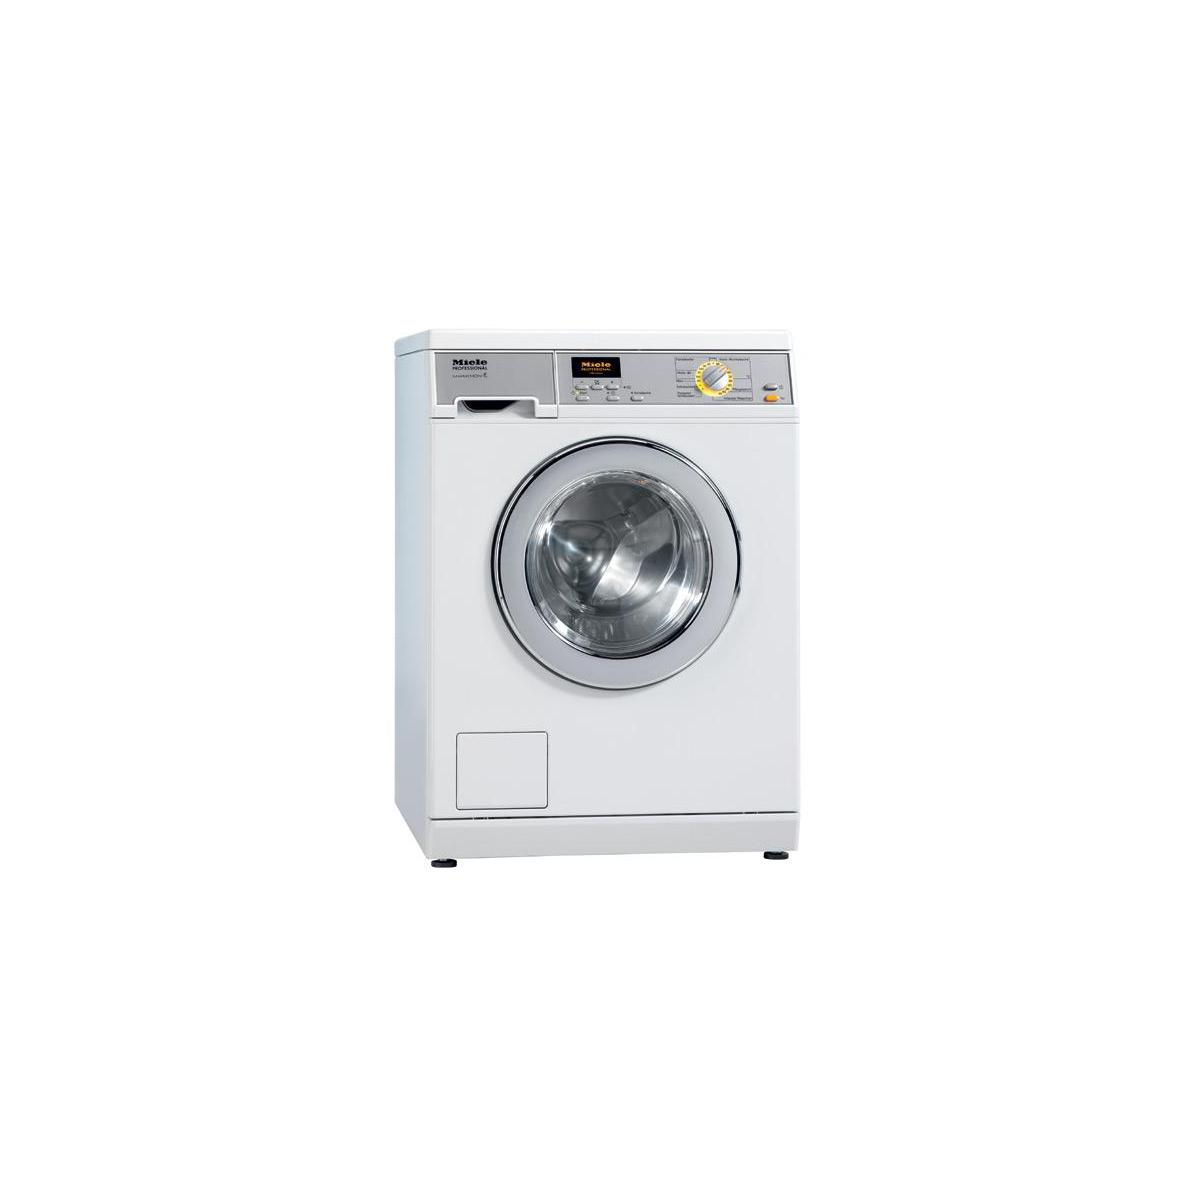 Miele professional 6 5kg washing machine pw5062dp13 - Miele professional ...